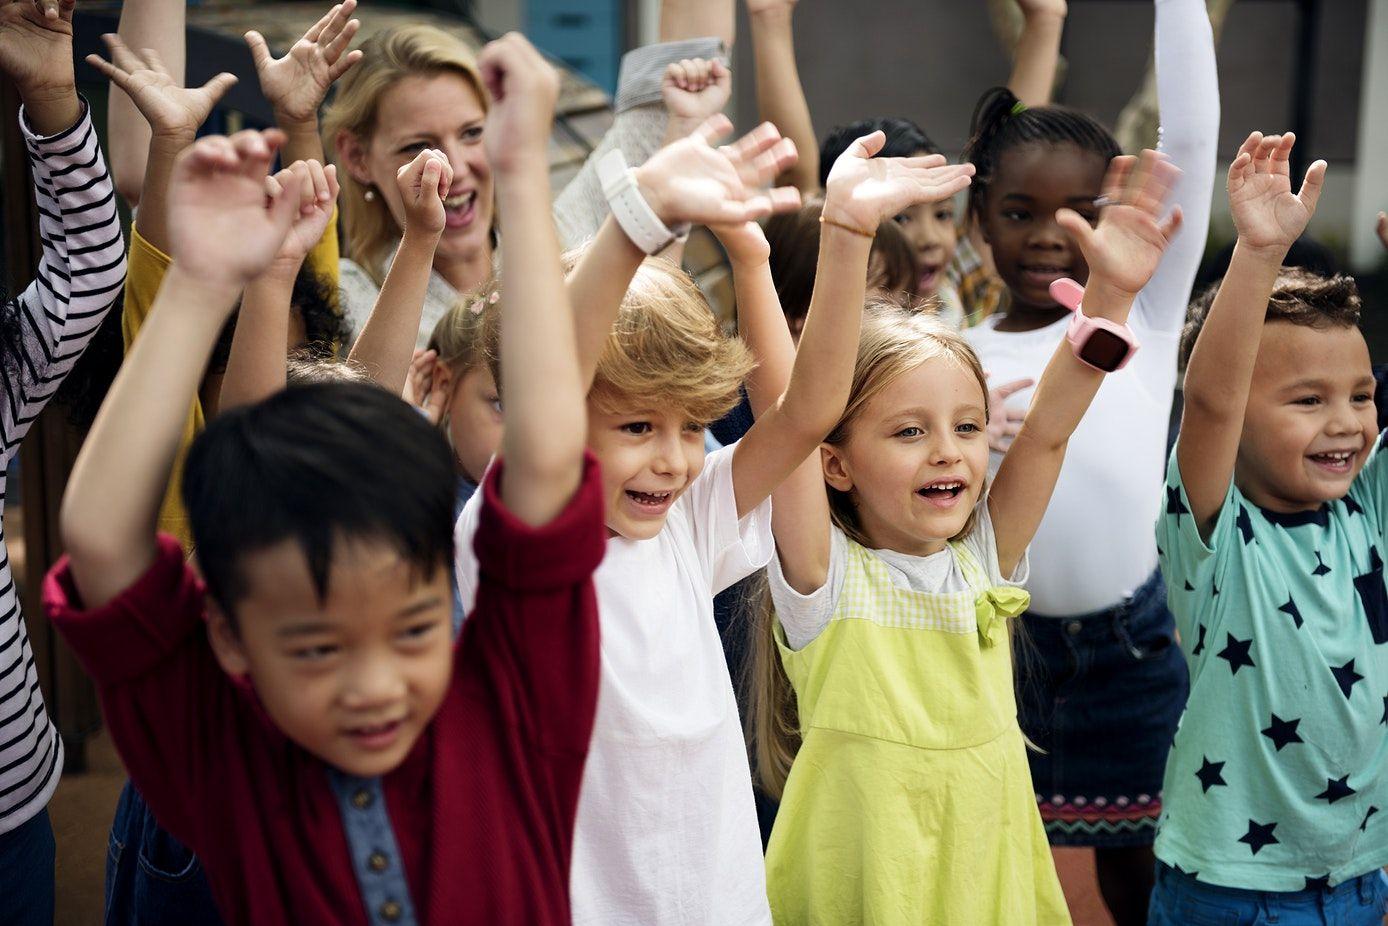 Download premium image of Happy kids at elementary school